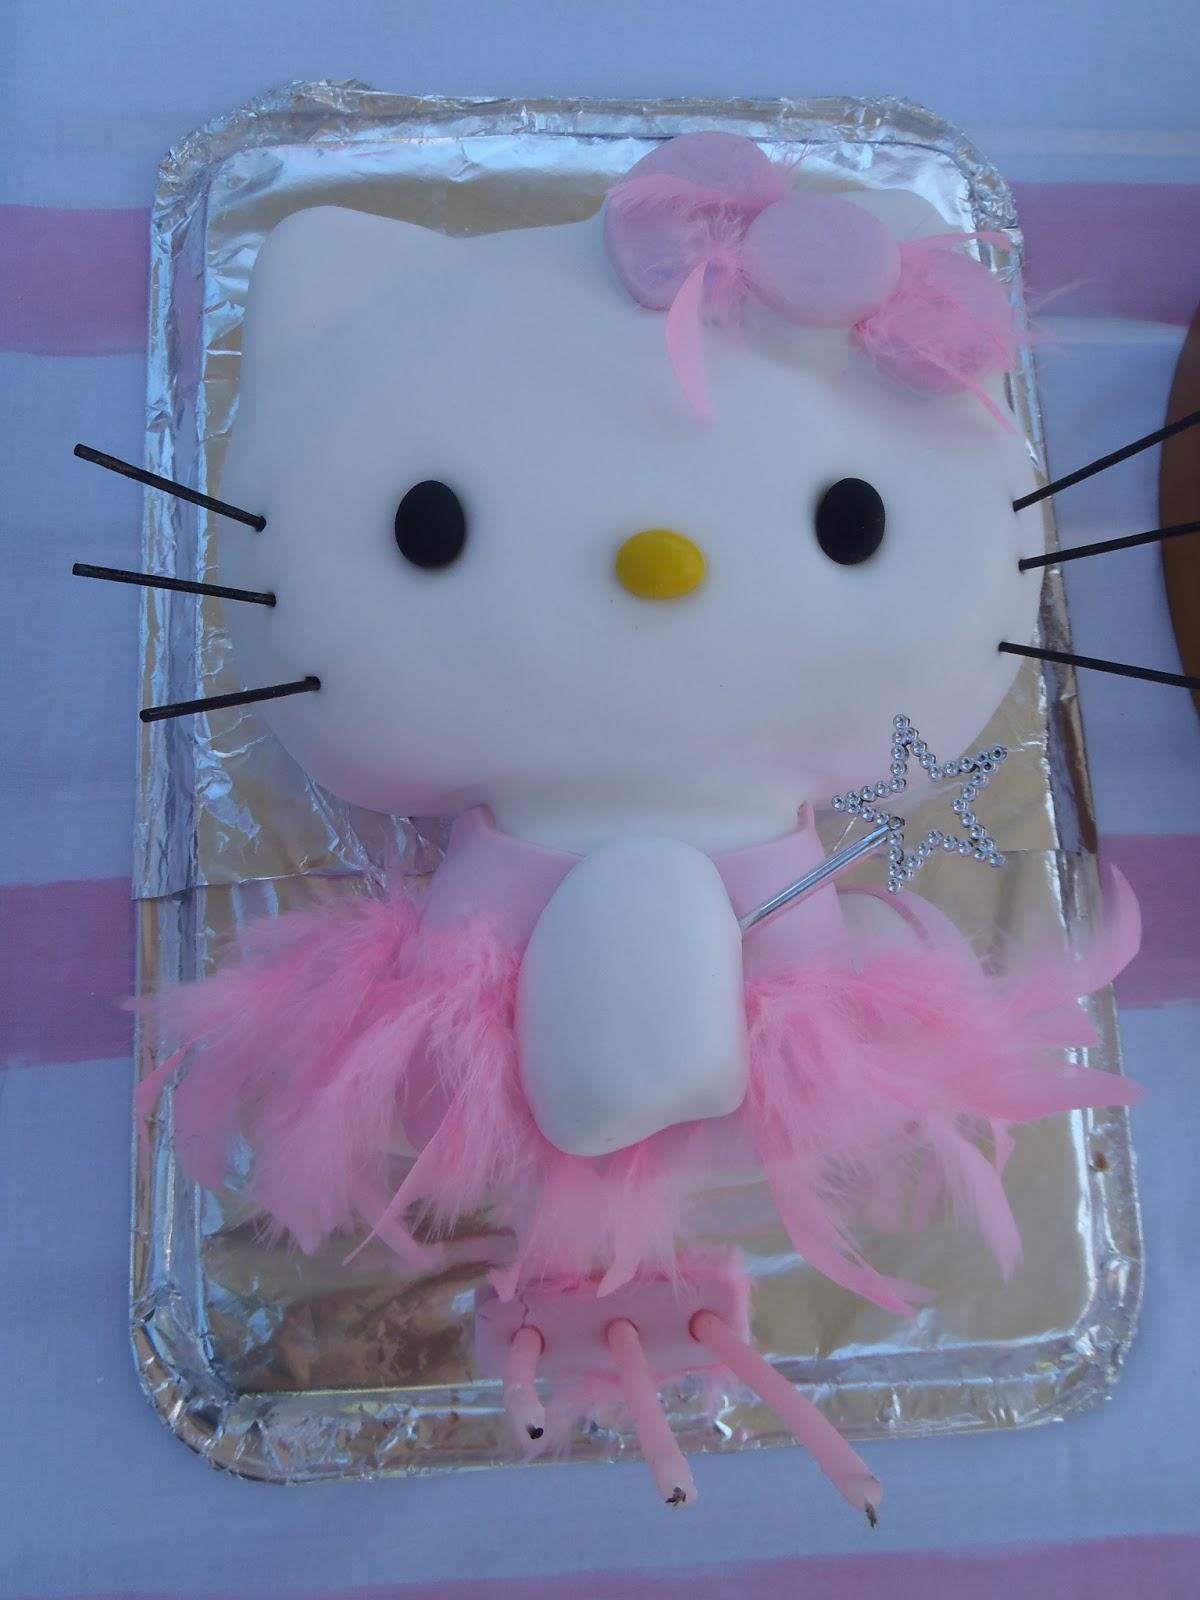 a7b0fdcdc LouSaysItsMeTime: Hello Kitty - Ballerina Cake